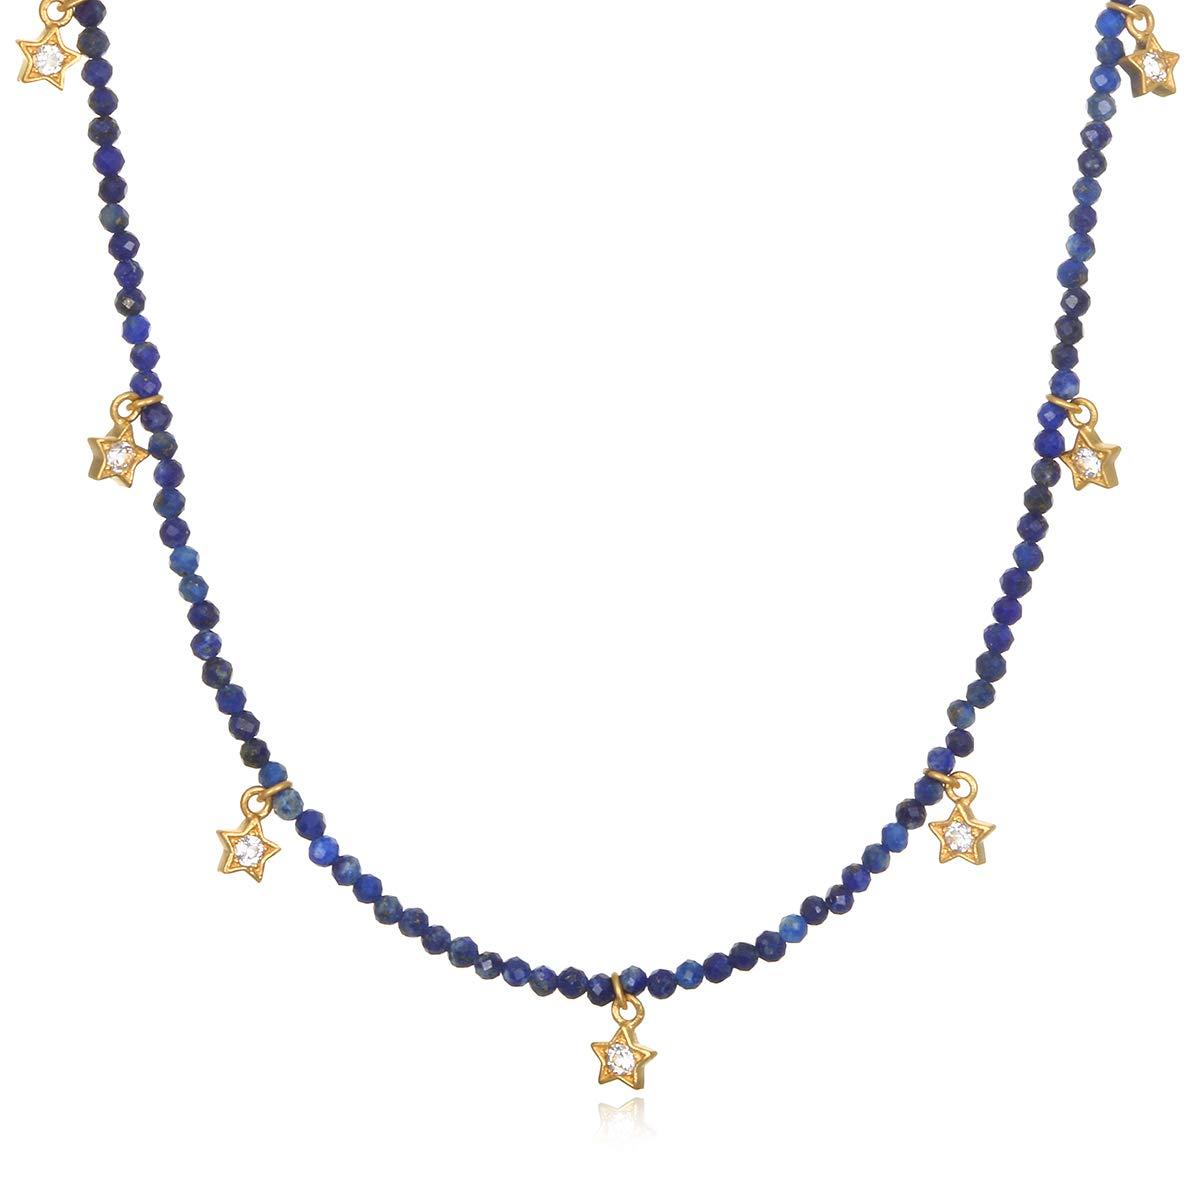 Satya Jewelry Sodalite & White Topaz Gold Star Choker Necklace (14-inch +2 ext), One Size